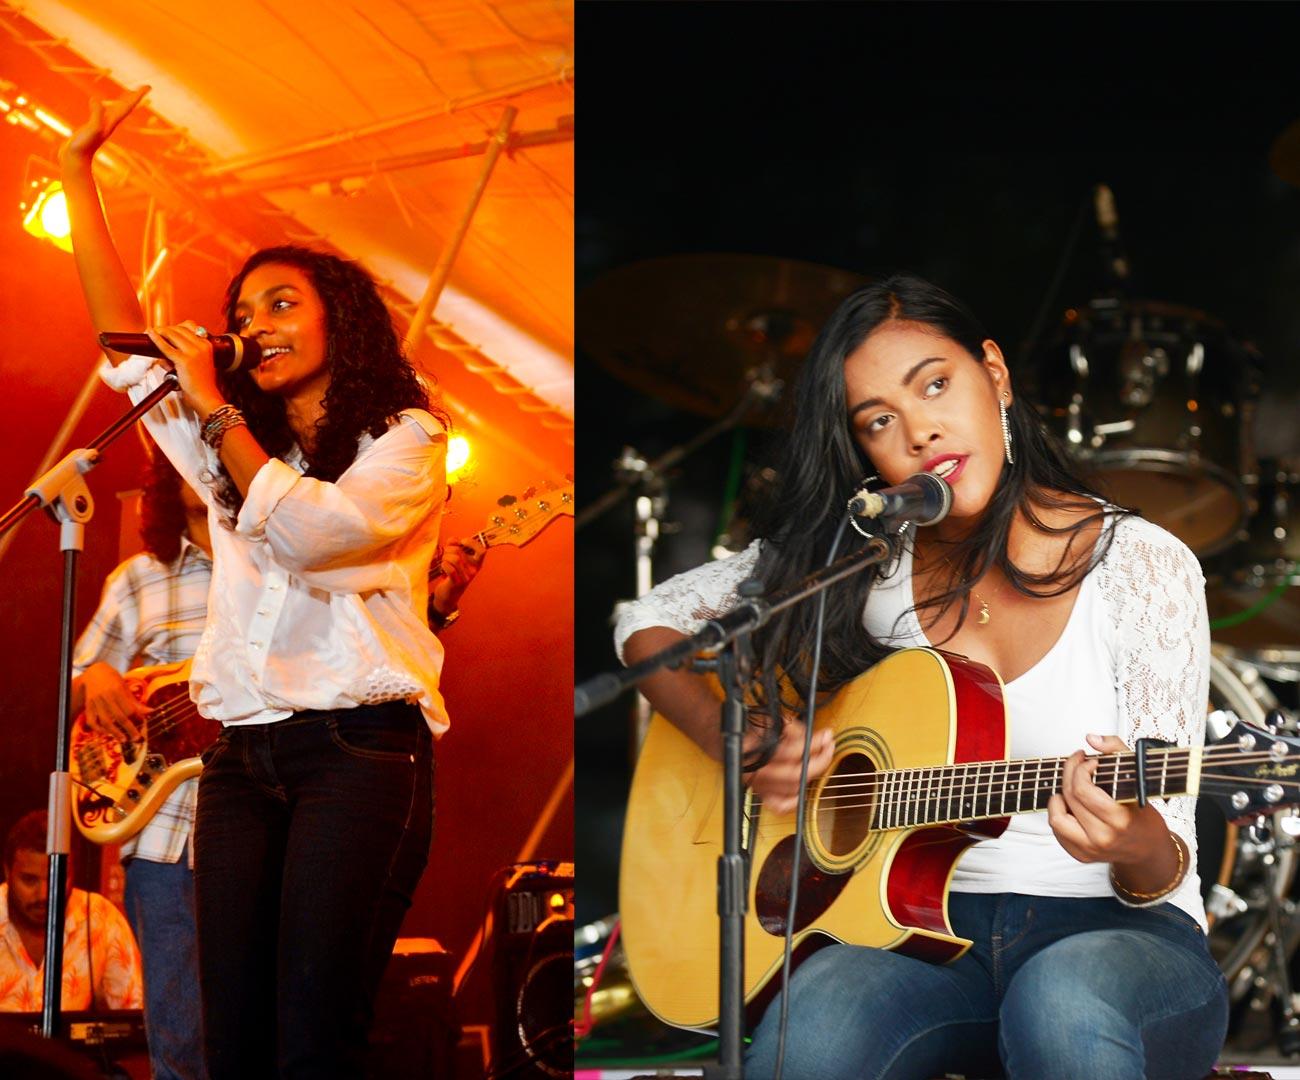 Live Blues Band Image | Live Music in Kurumba Maldives